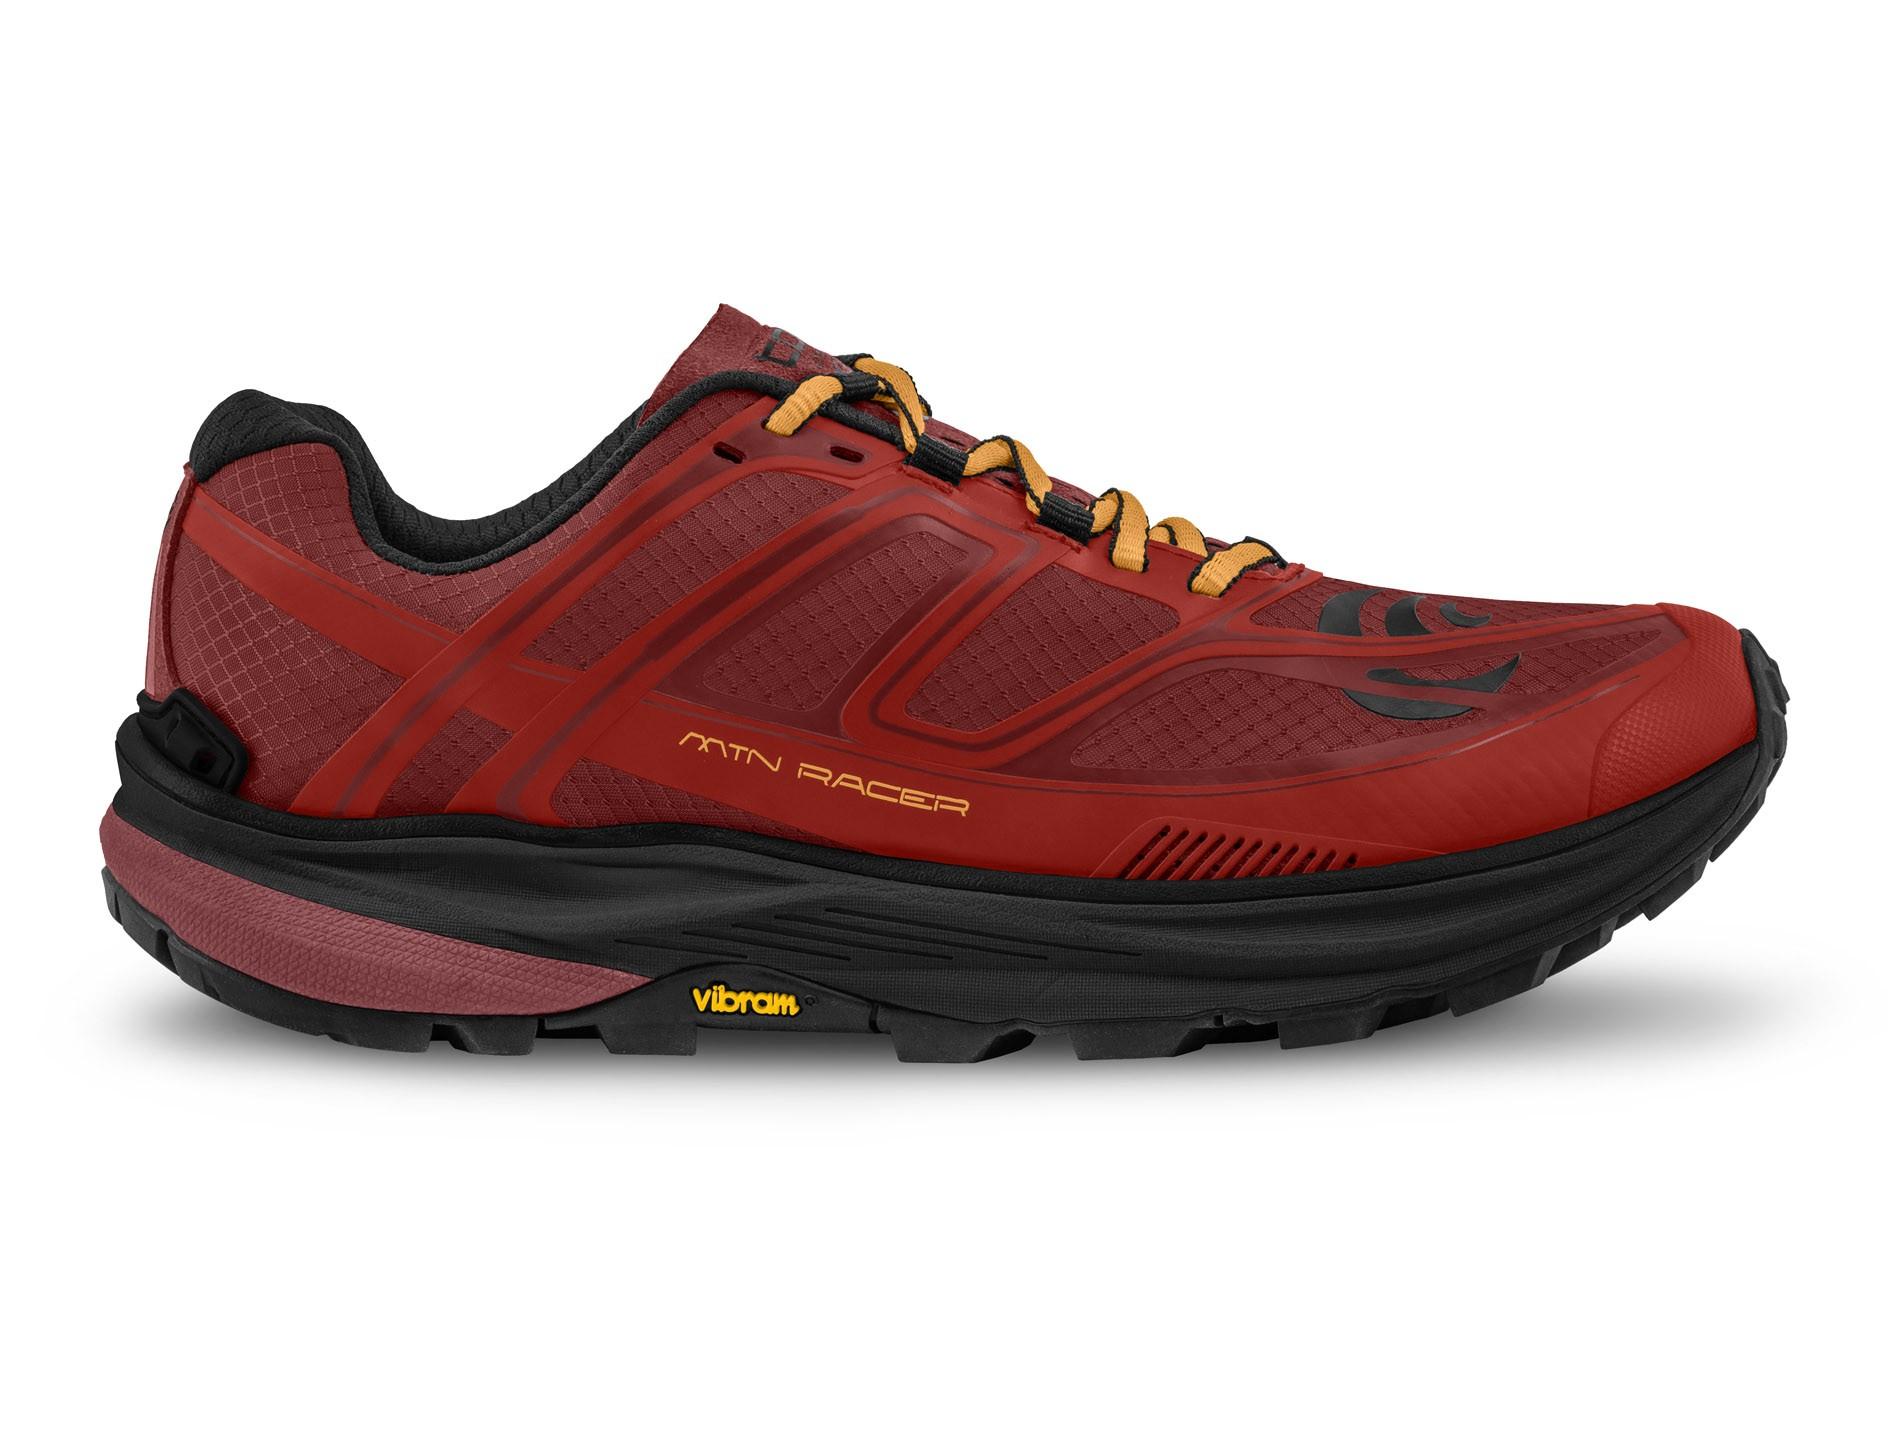 8ea020e002a269 Topo Athletic Shoes & Gear | Move Better. Naturally.